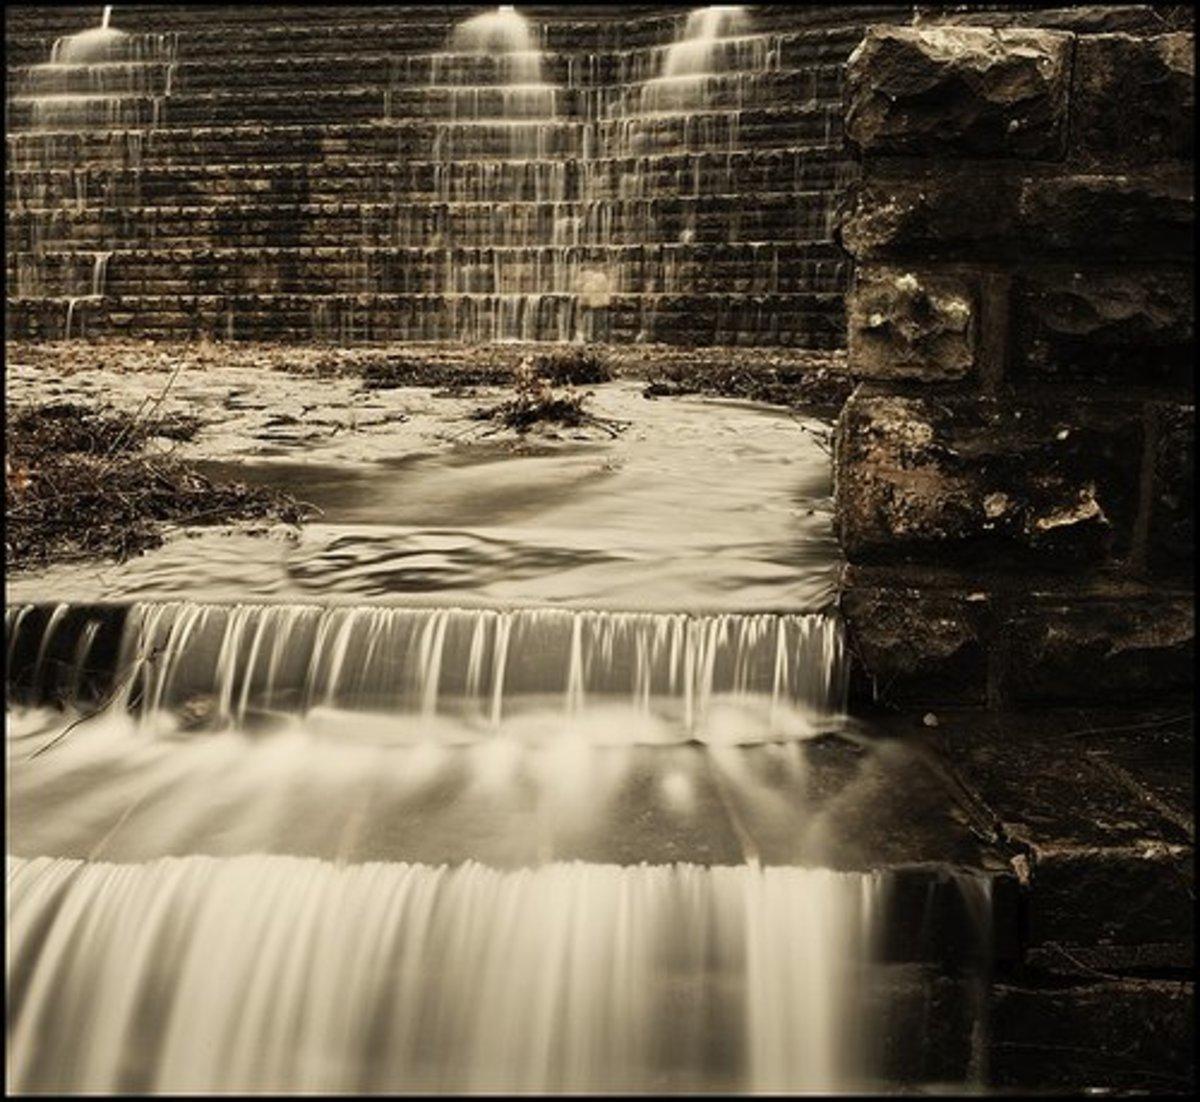 Near Okmulgee State Park, the Okmulgee Lake spillway is an engineering marvel.